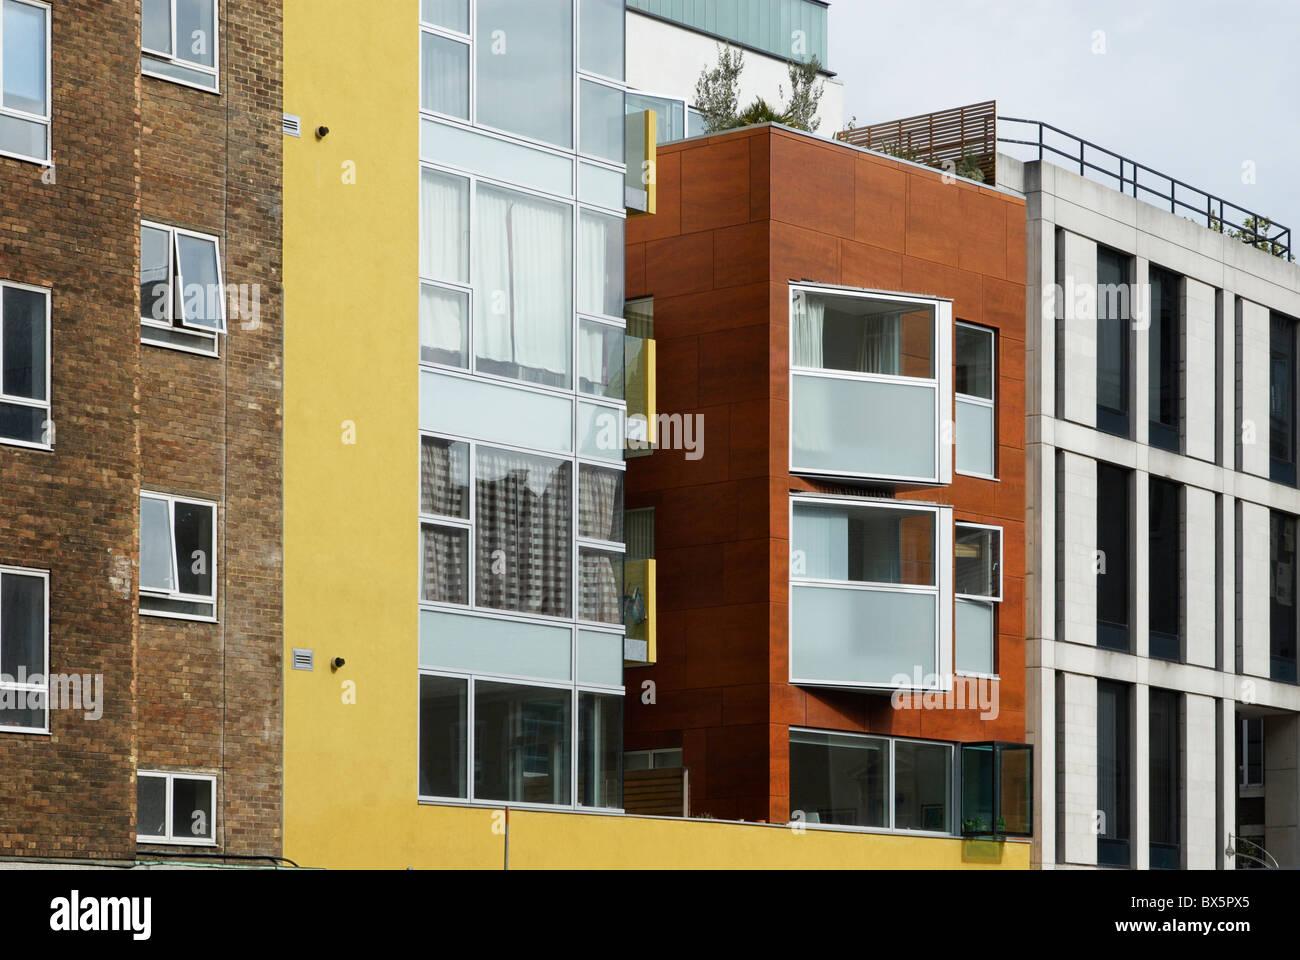 Modern apartments Clerkenwell Central London UK - Stock Image